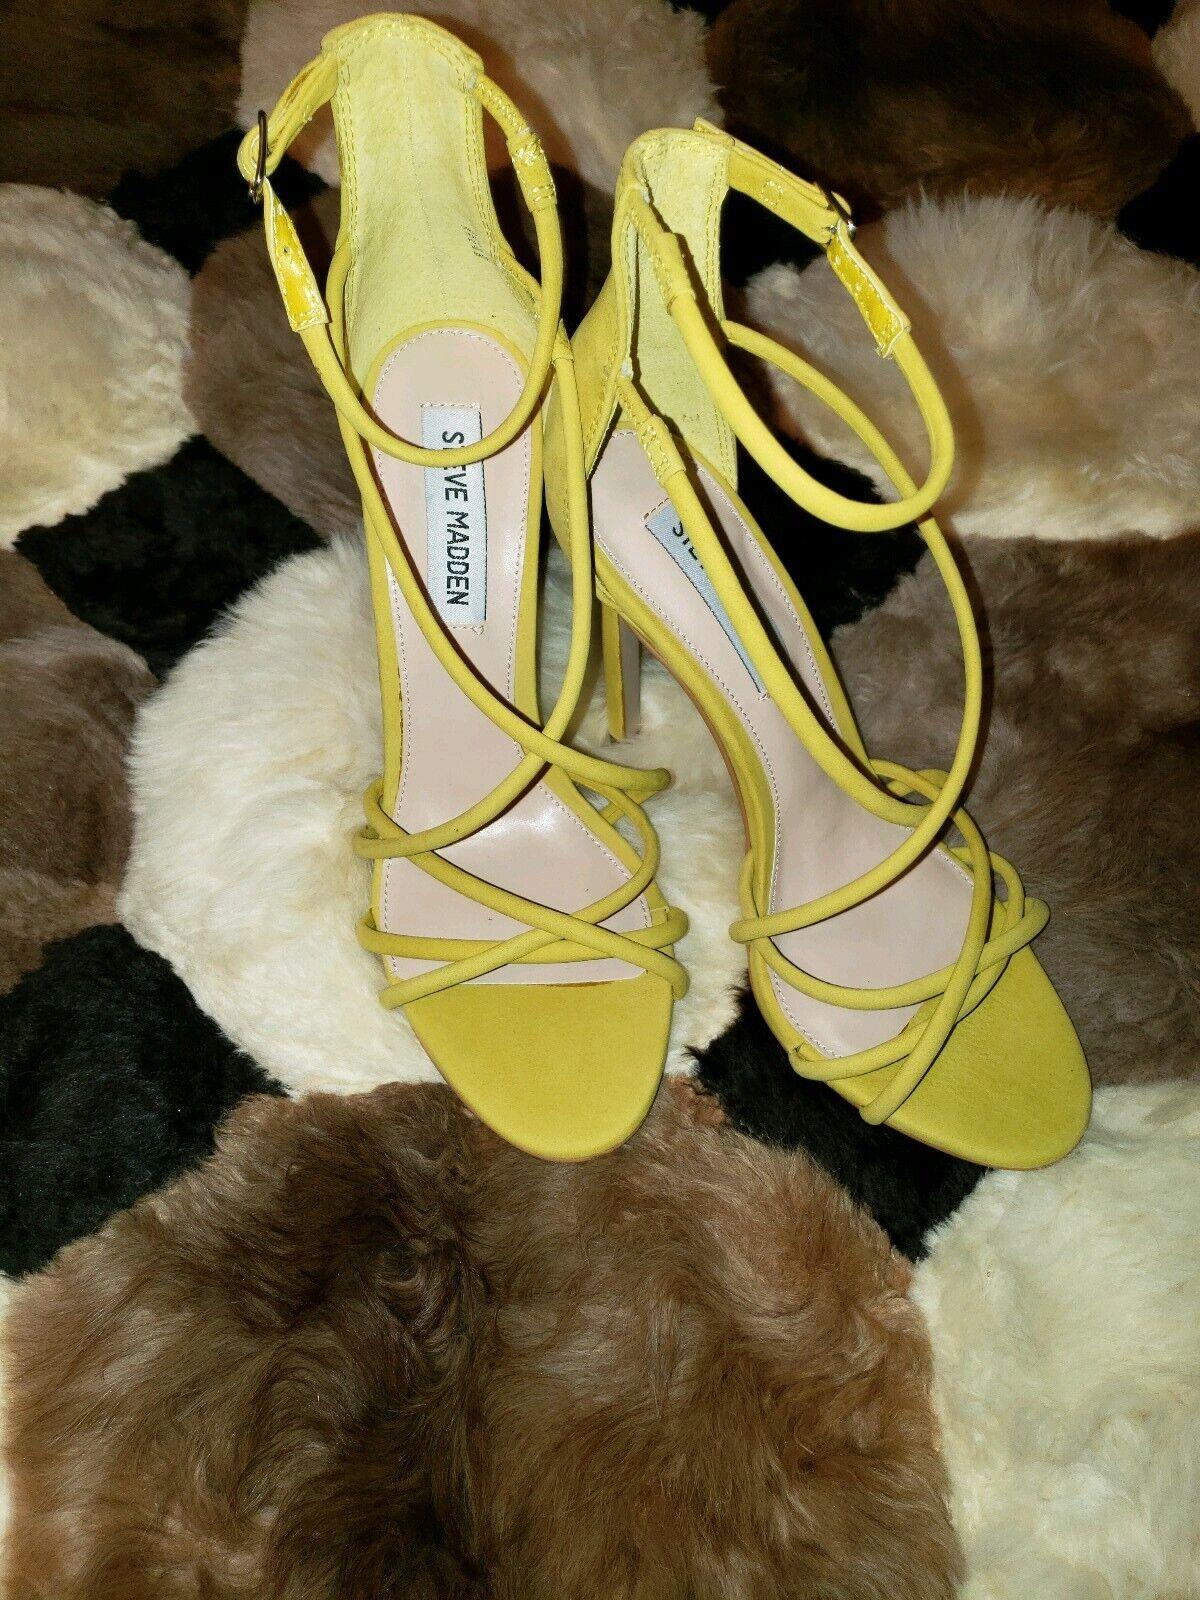 Steve Madden Strapped 7 1 2 Heels Yellow Nubuck 7.5 stiletto